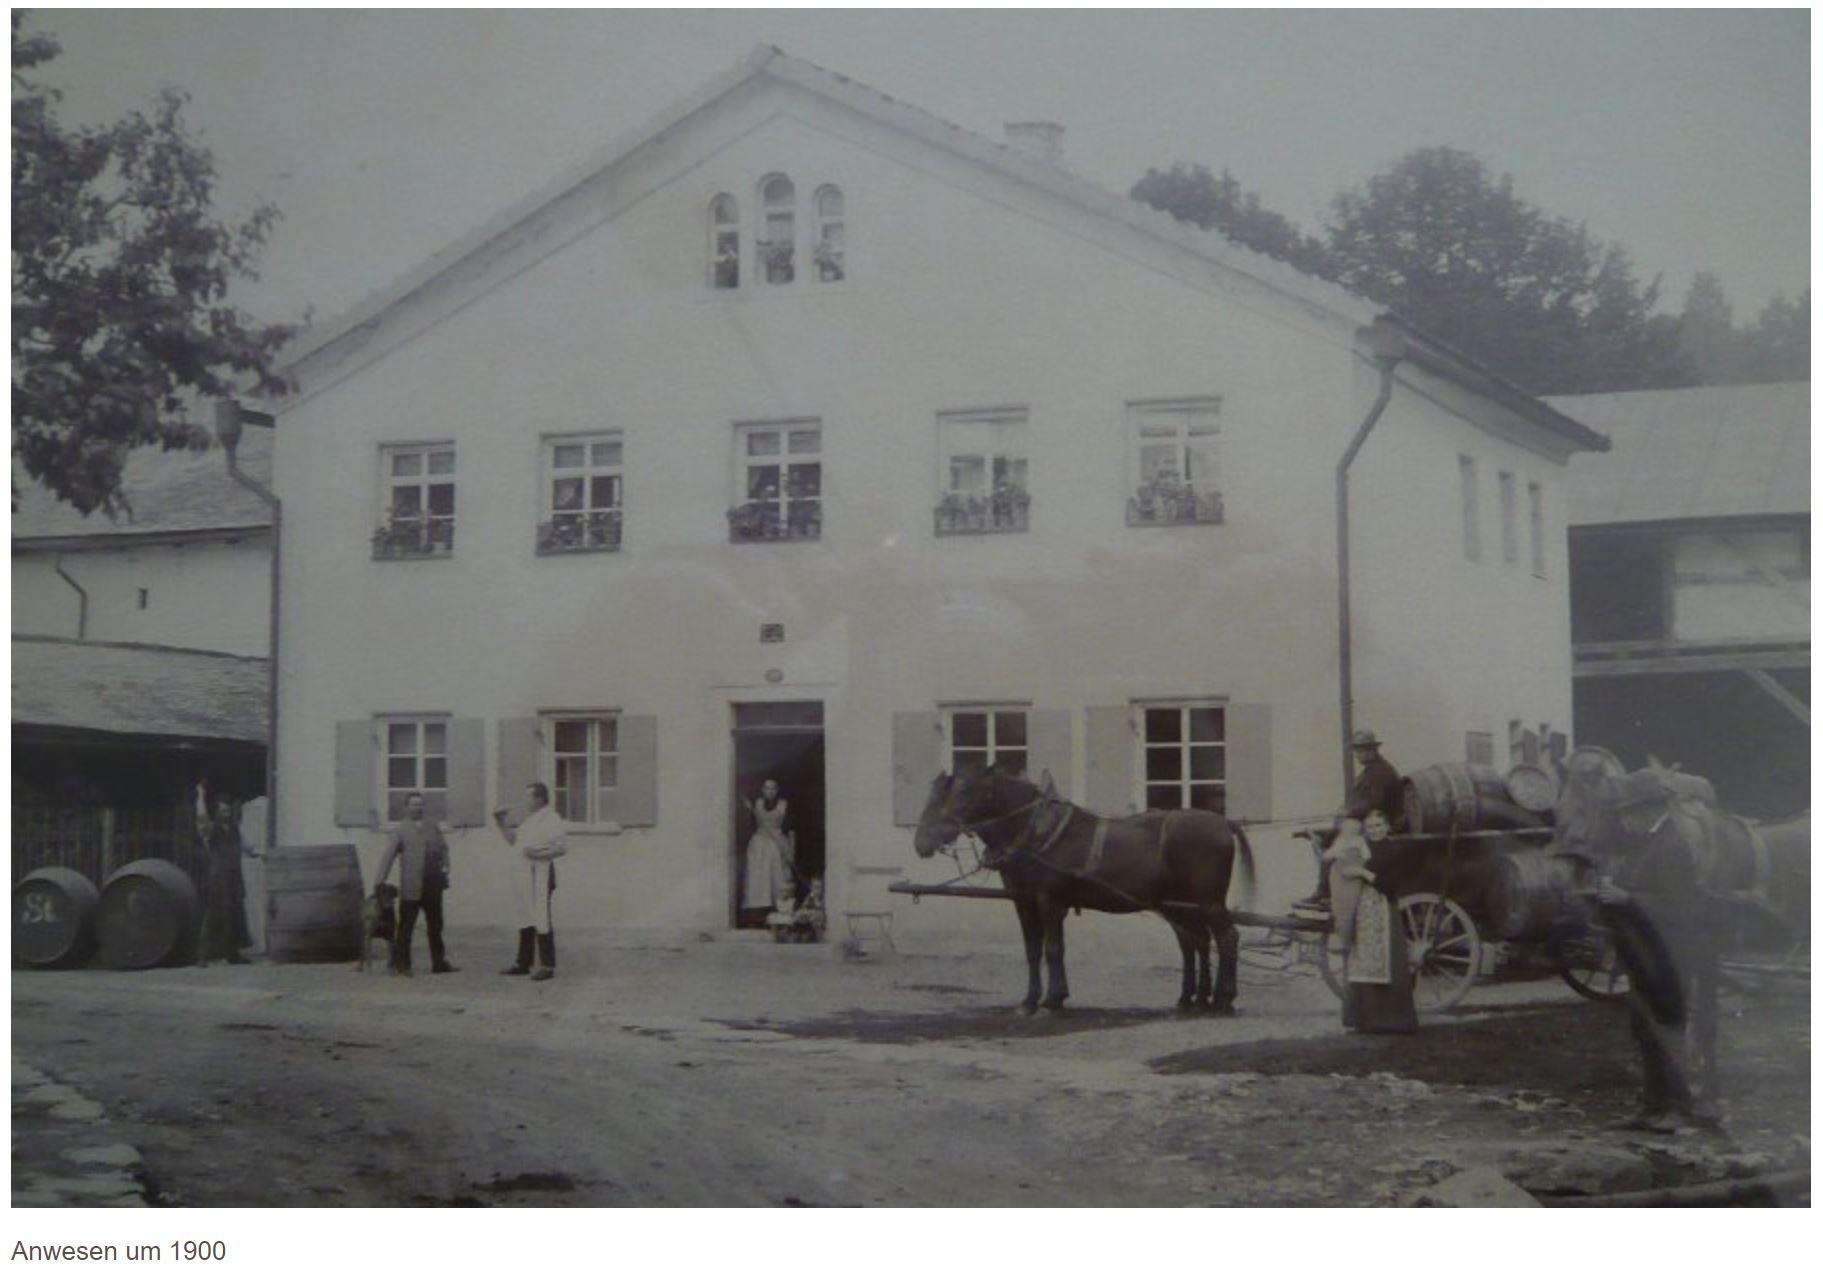 stuerhof-getraenke-haus-1900